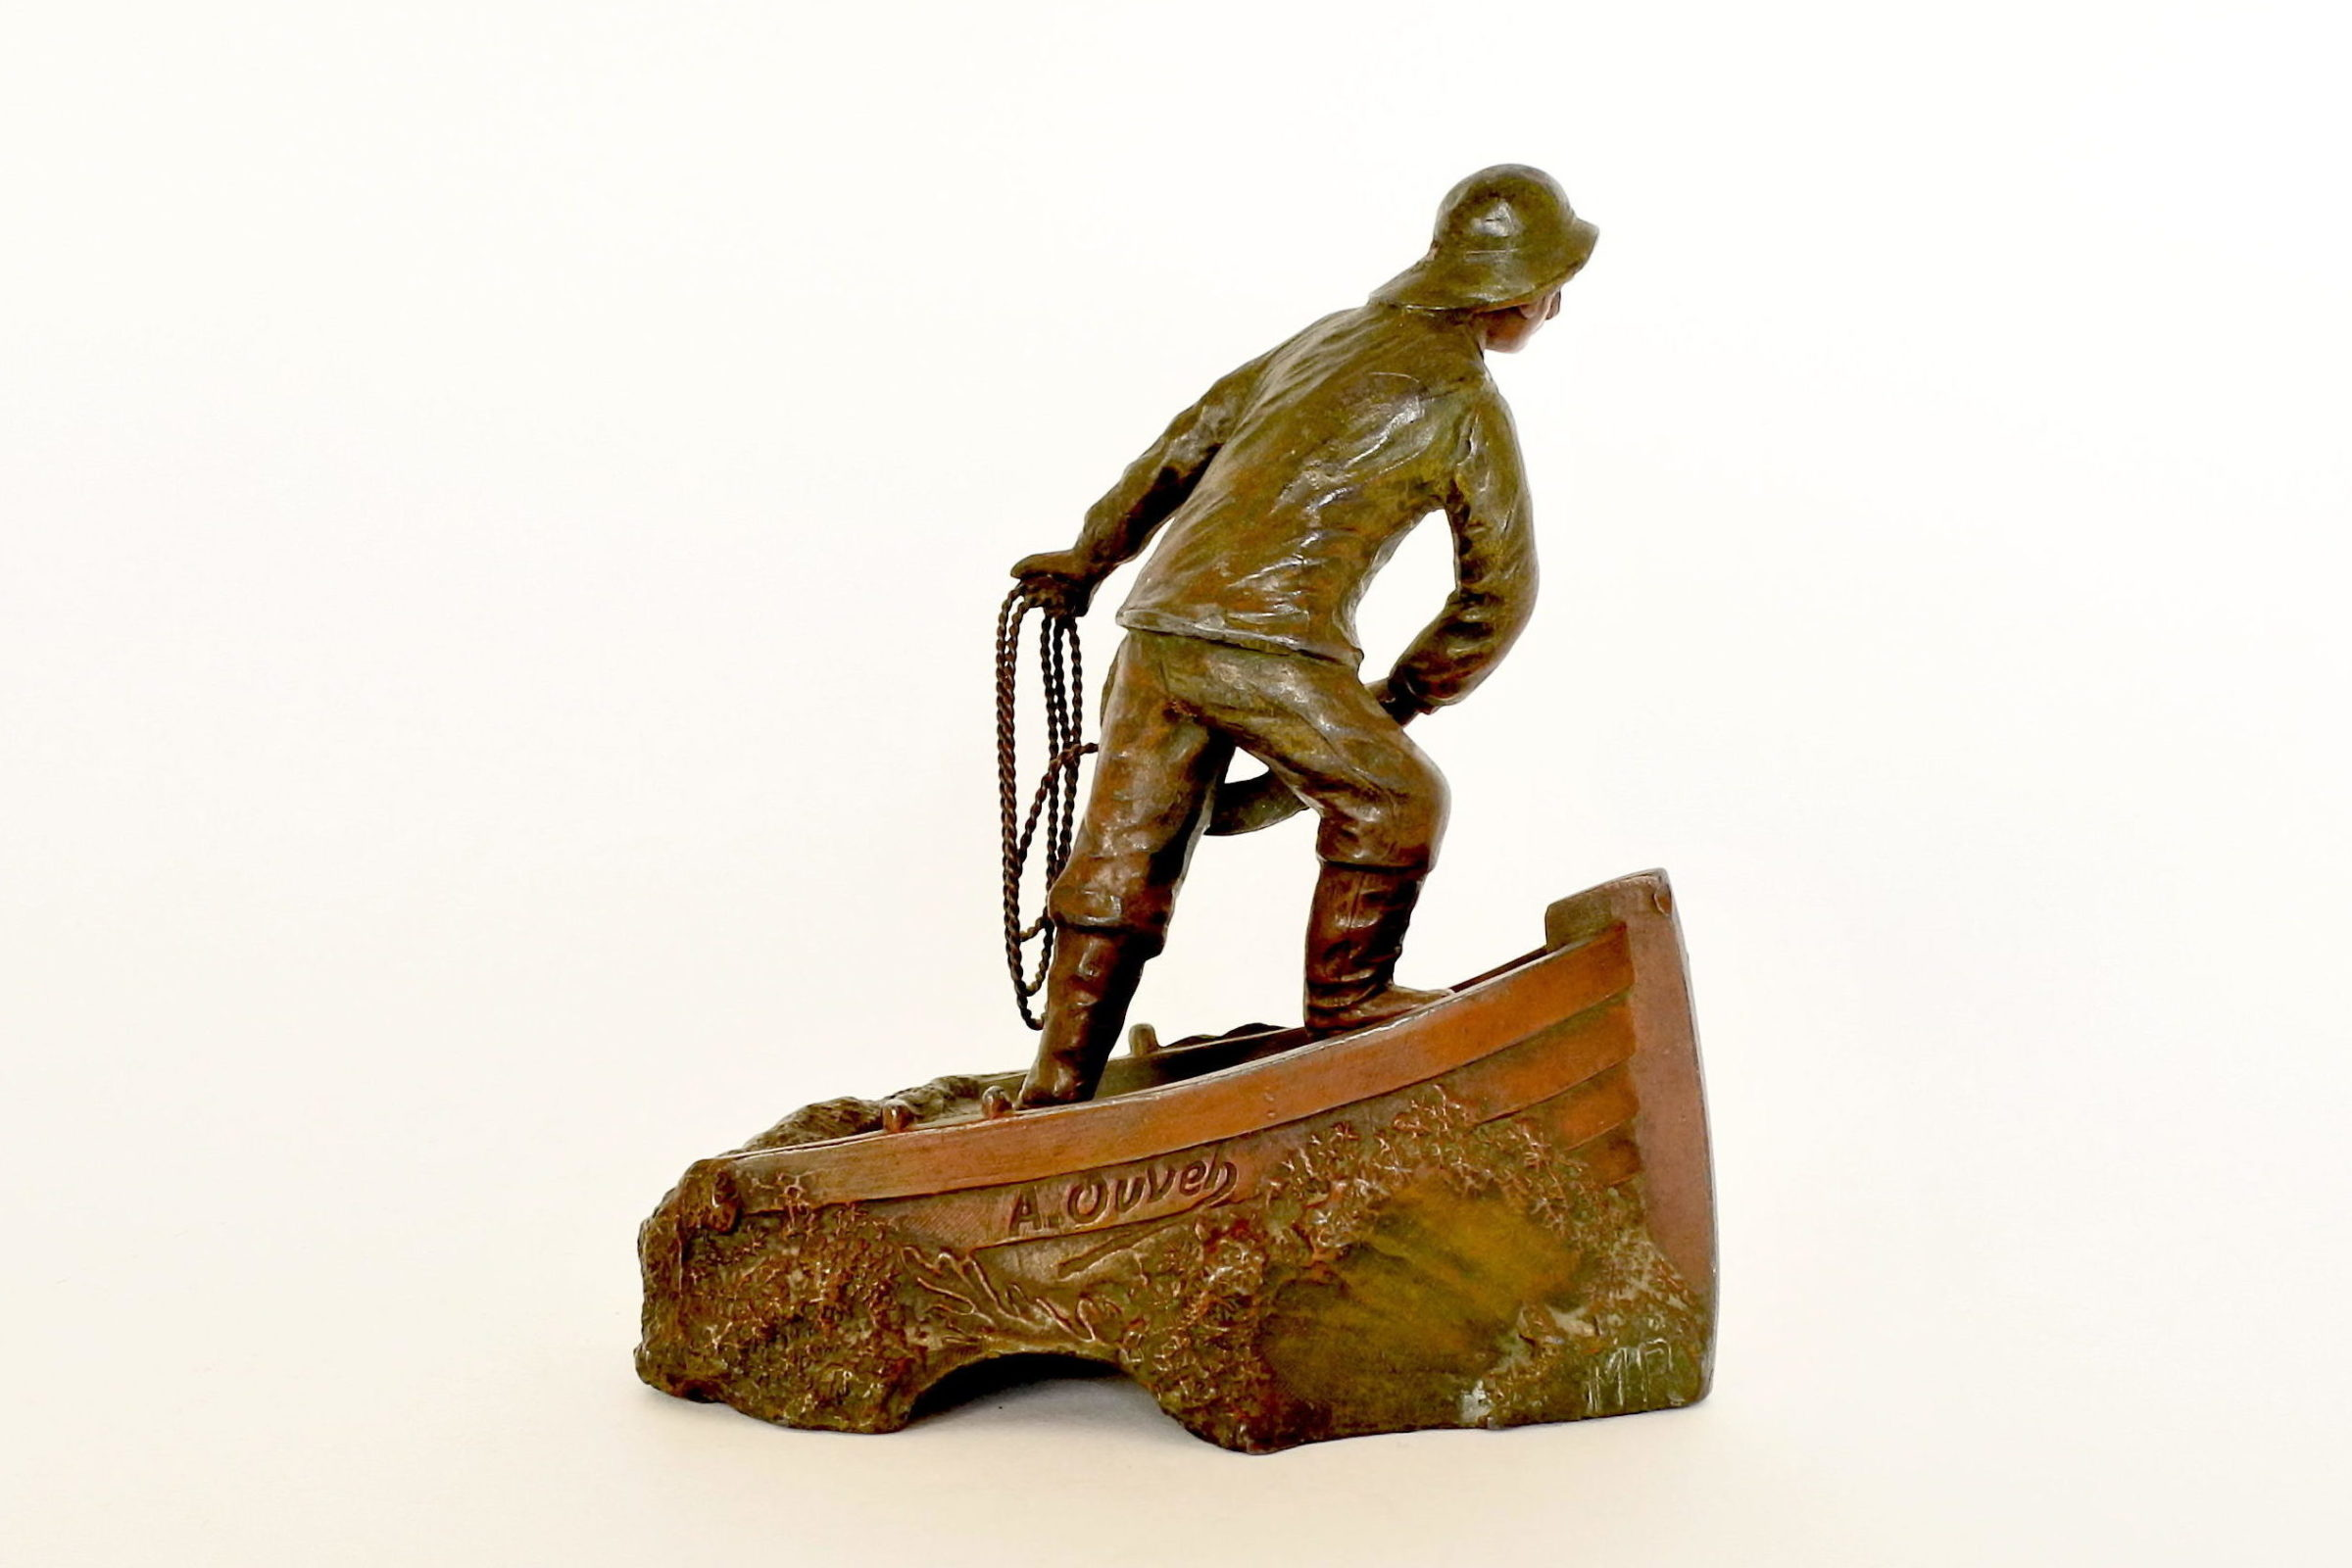 Statuina in bronzo patinato con marinaio - A.Ouvet - 3